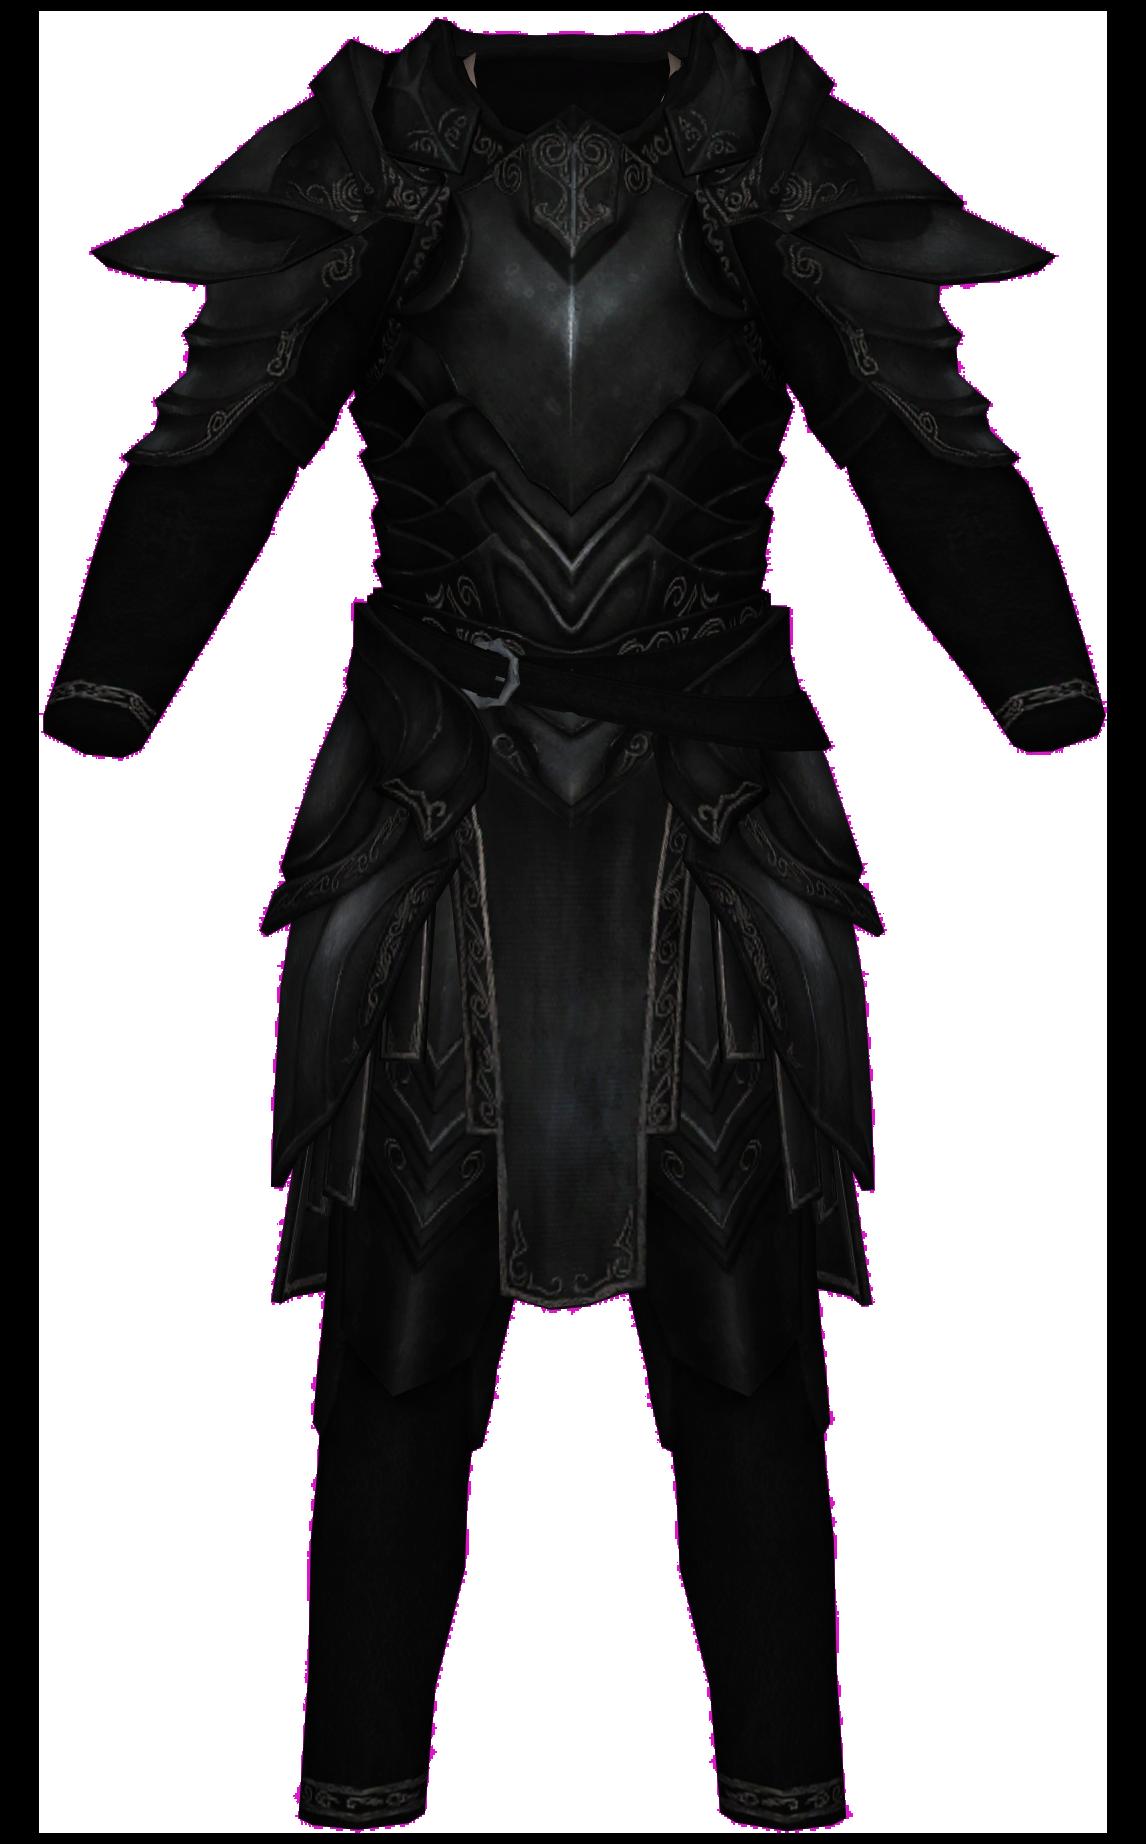 Ebony Armor (Armor Piece)